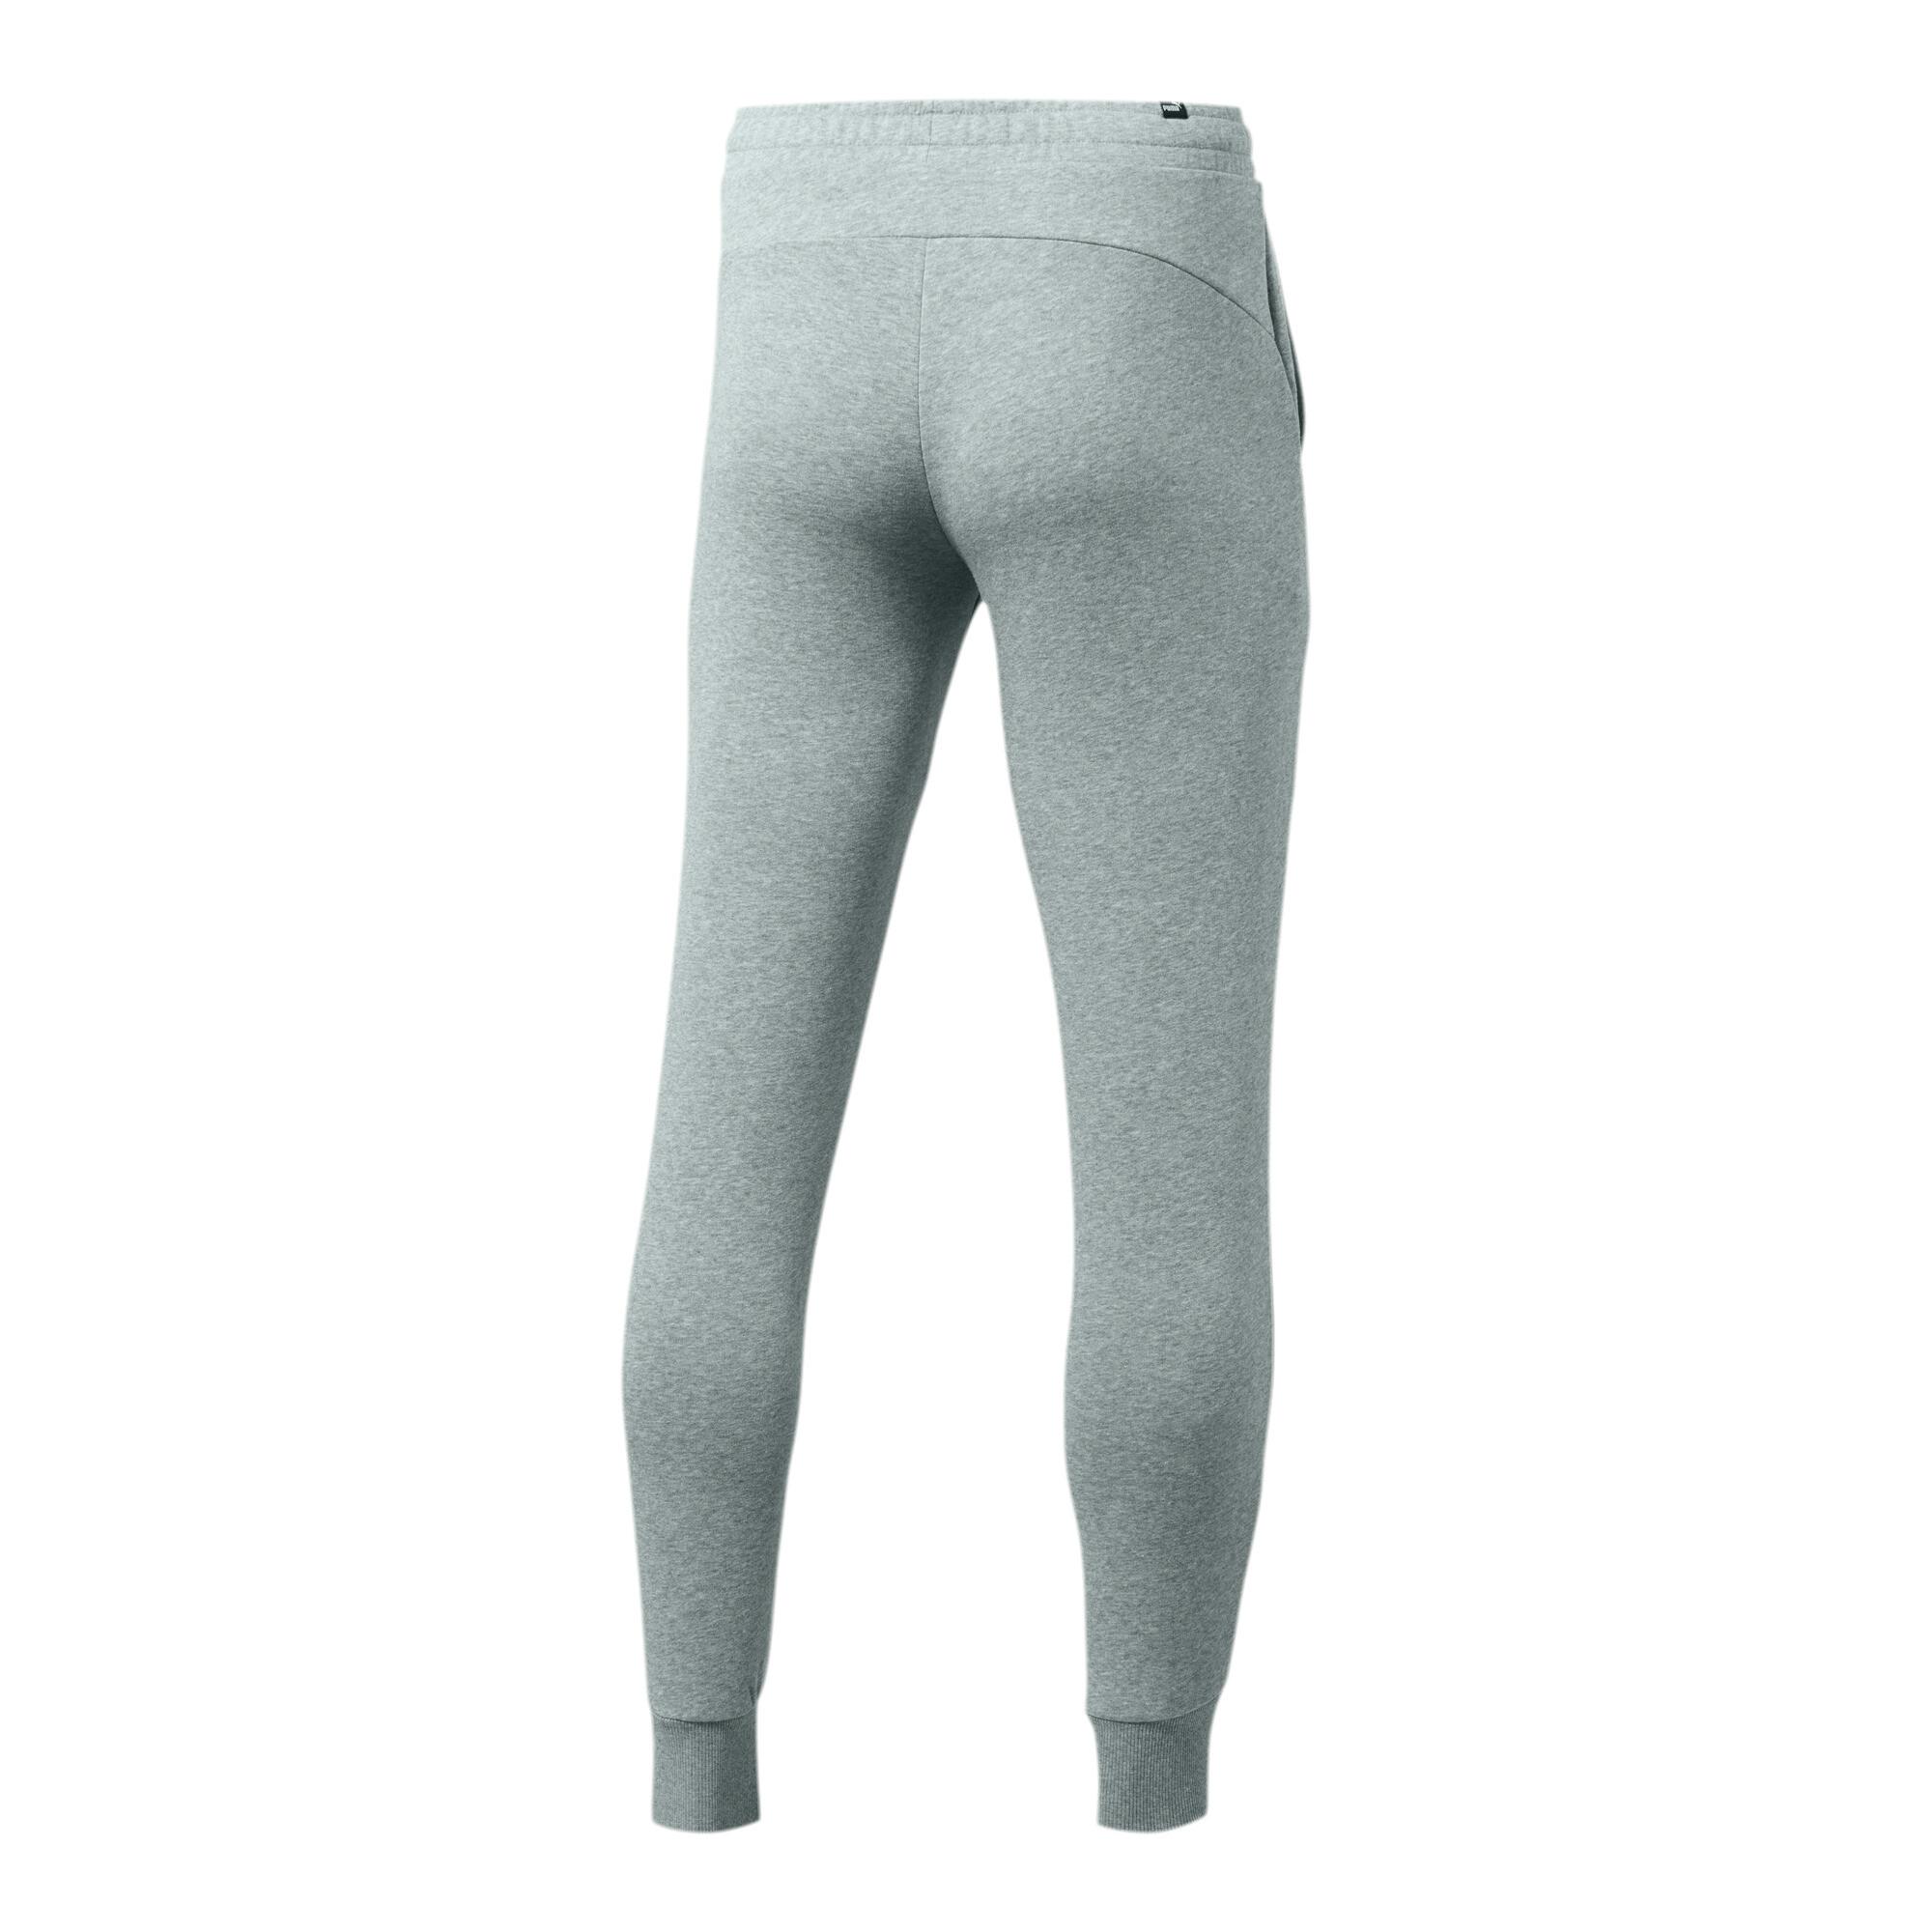 PUMA-Essentials-Men-039-s-Sweatpants-Men-Knitted-Pants-Basics thumbnail 3